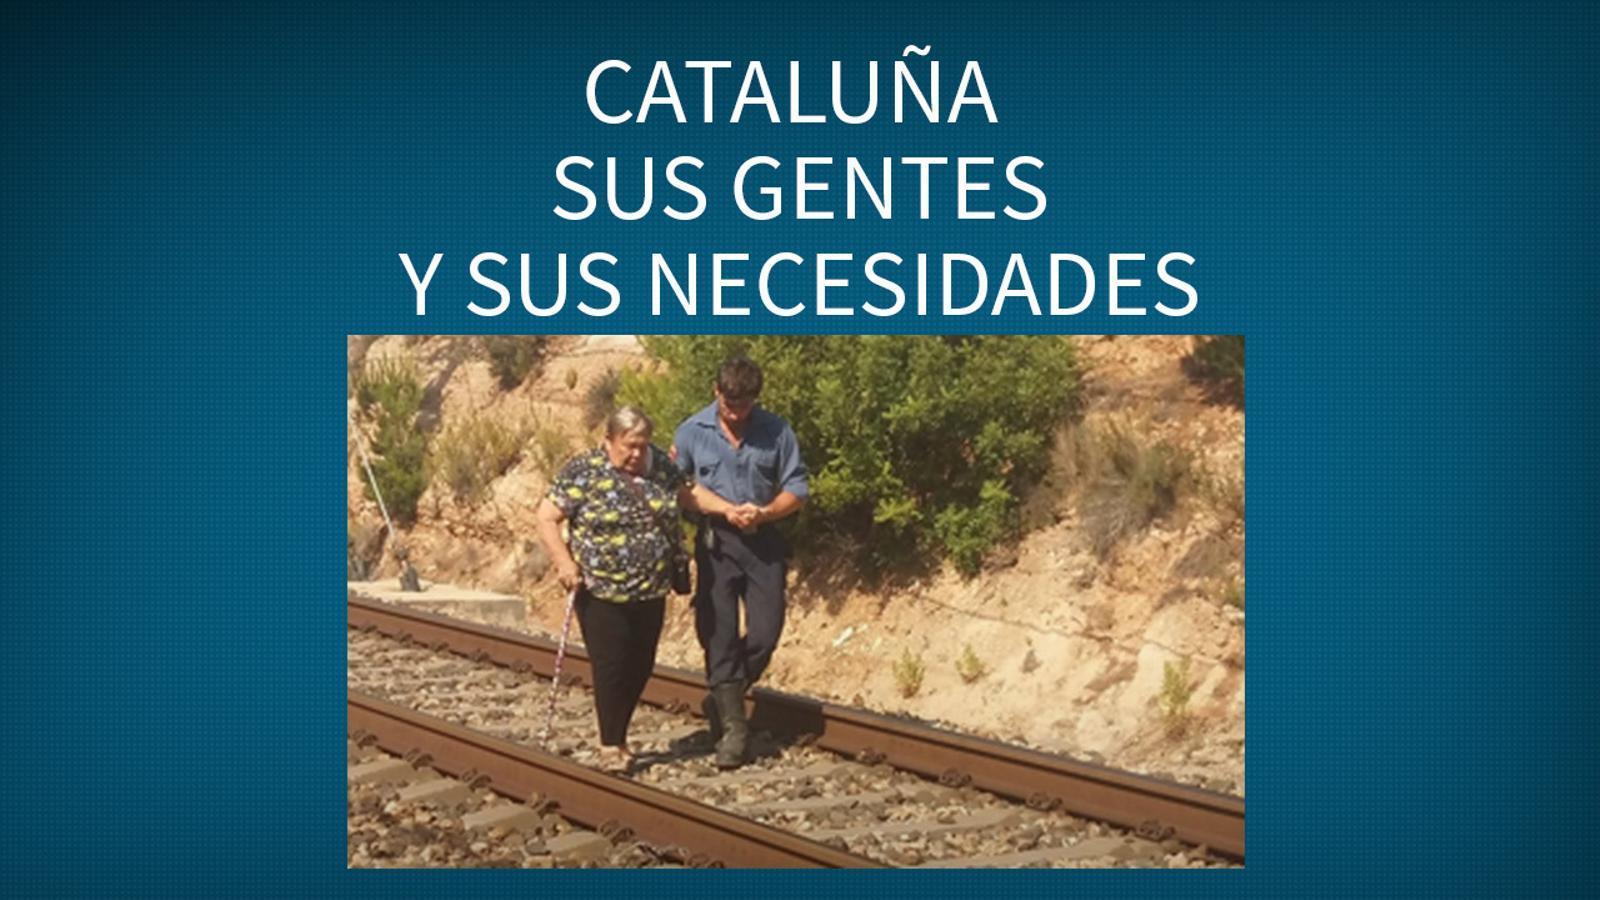 L'anàlisi d'Antoni Bassas: 'Cataluña: conozca a sus gentes'